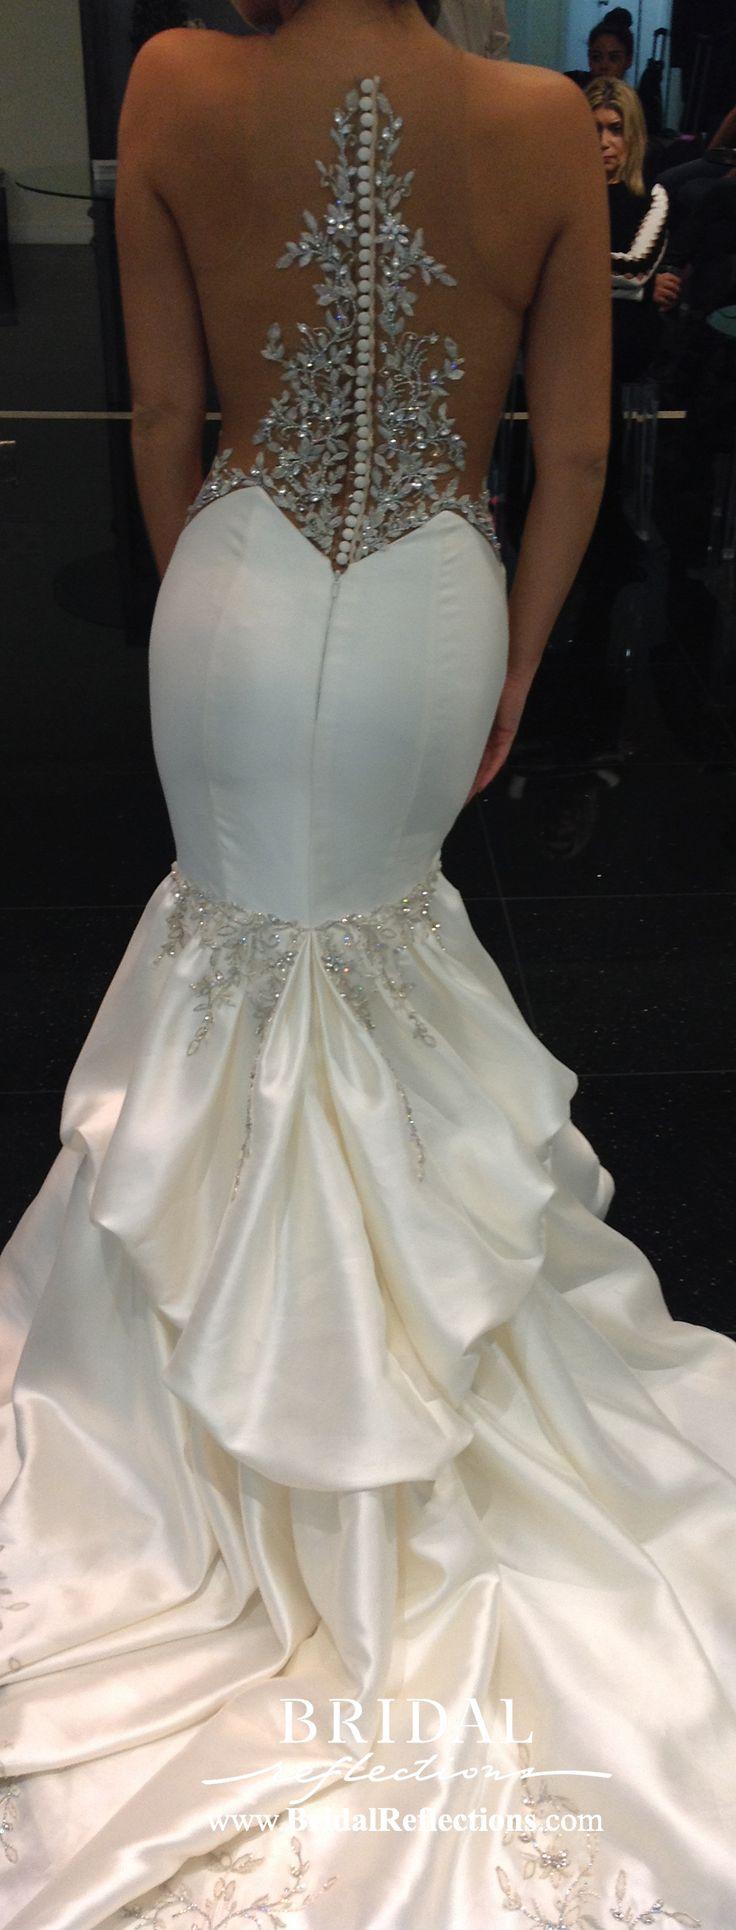 2161 best Inspiration for the Bling Bride images on Pinterest